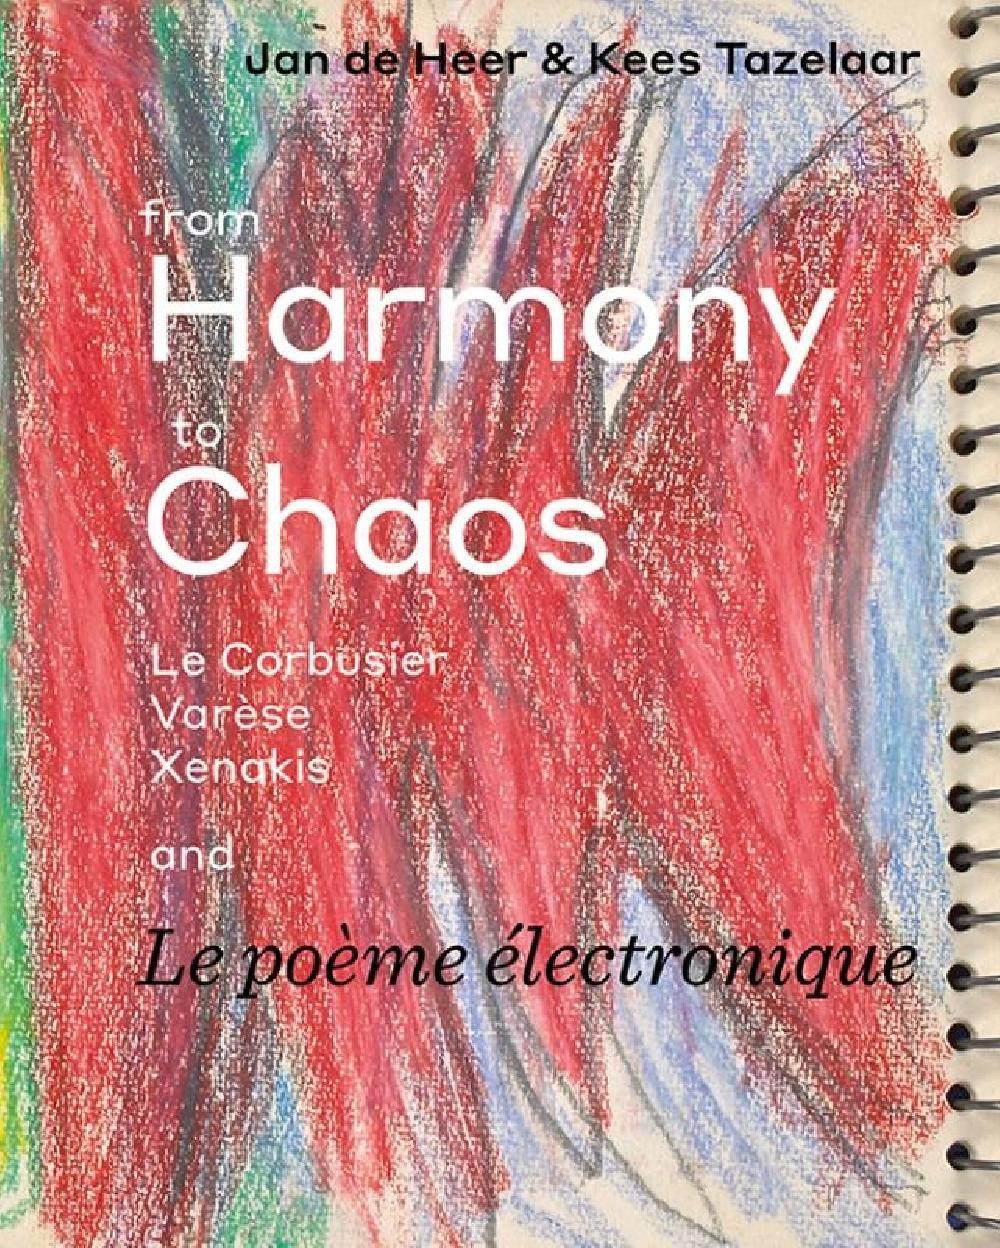 From Harmony to Chaos: Le Corbusier, Varèse, Xenakis and Le poème électronique